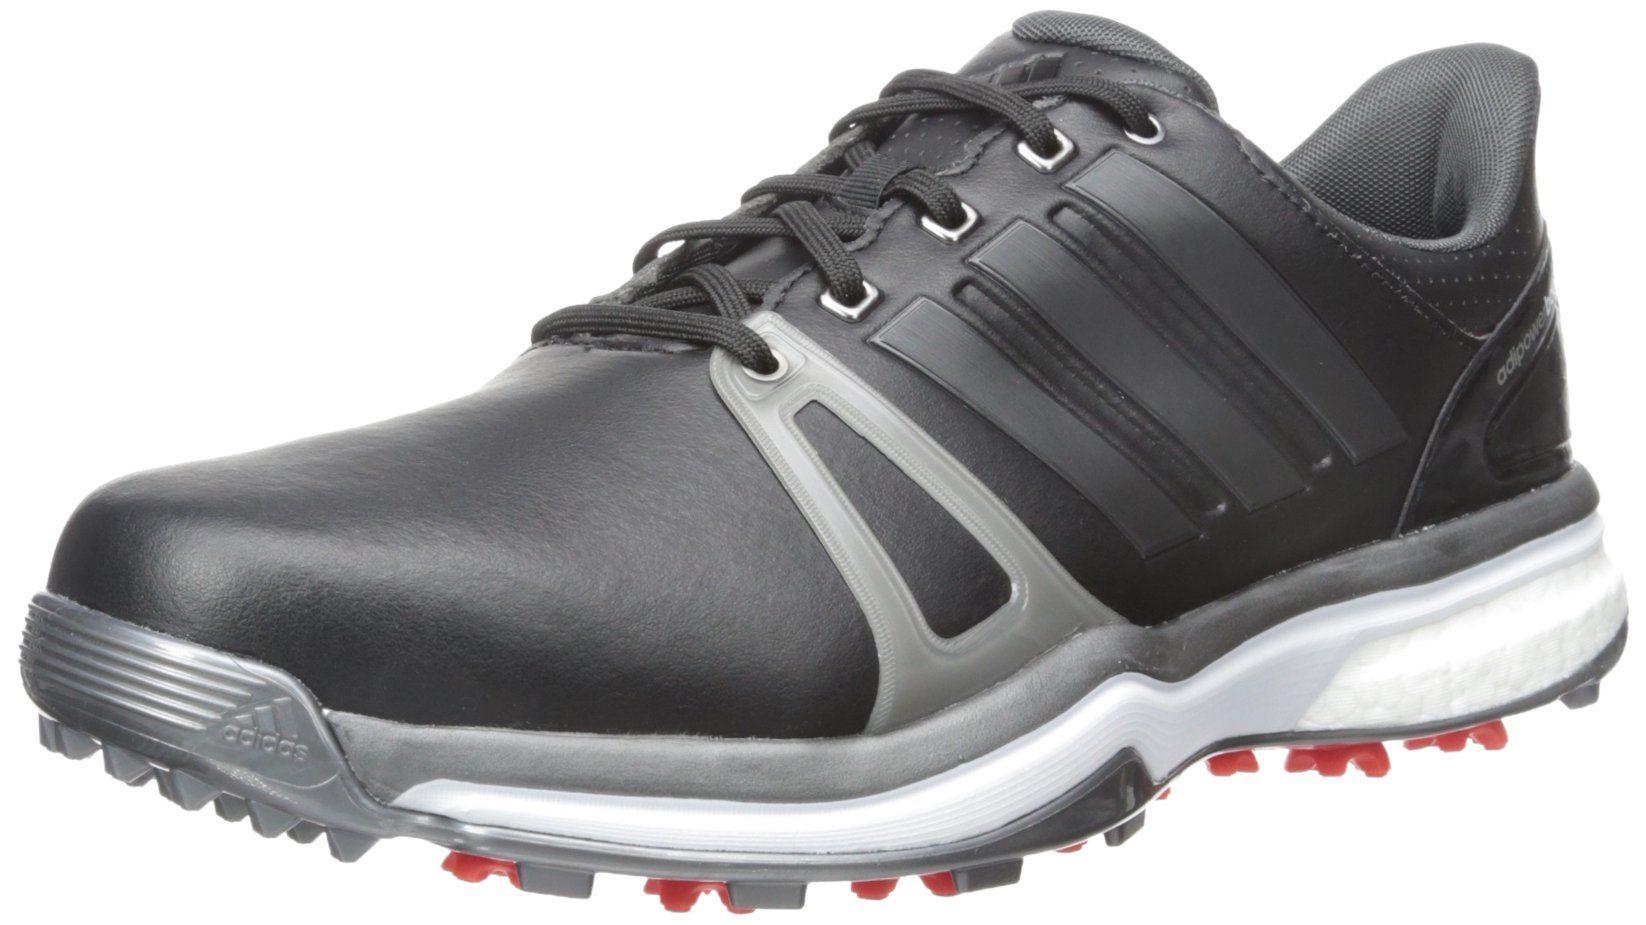 Adidas hombre 's Adipower Boost 2 WD Golf rastras, Core Negro / oscuro